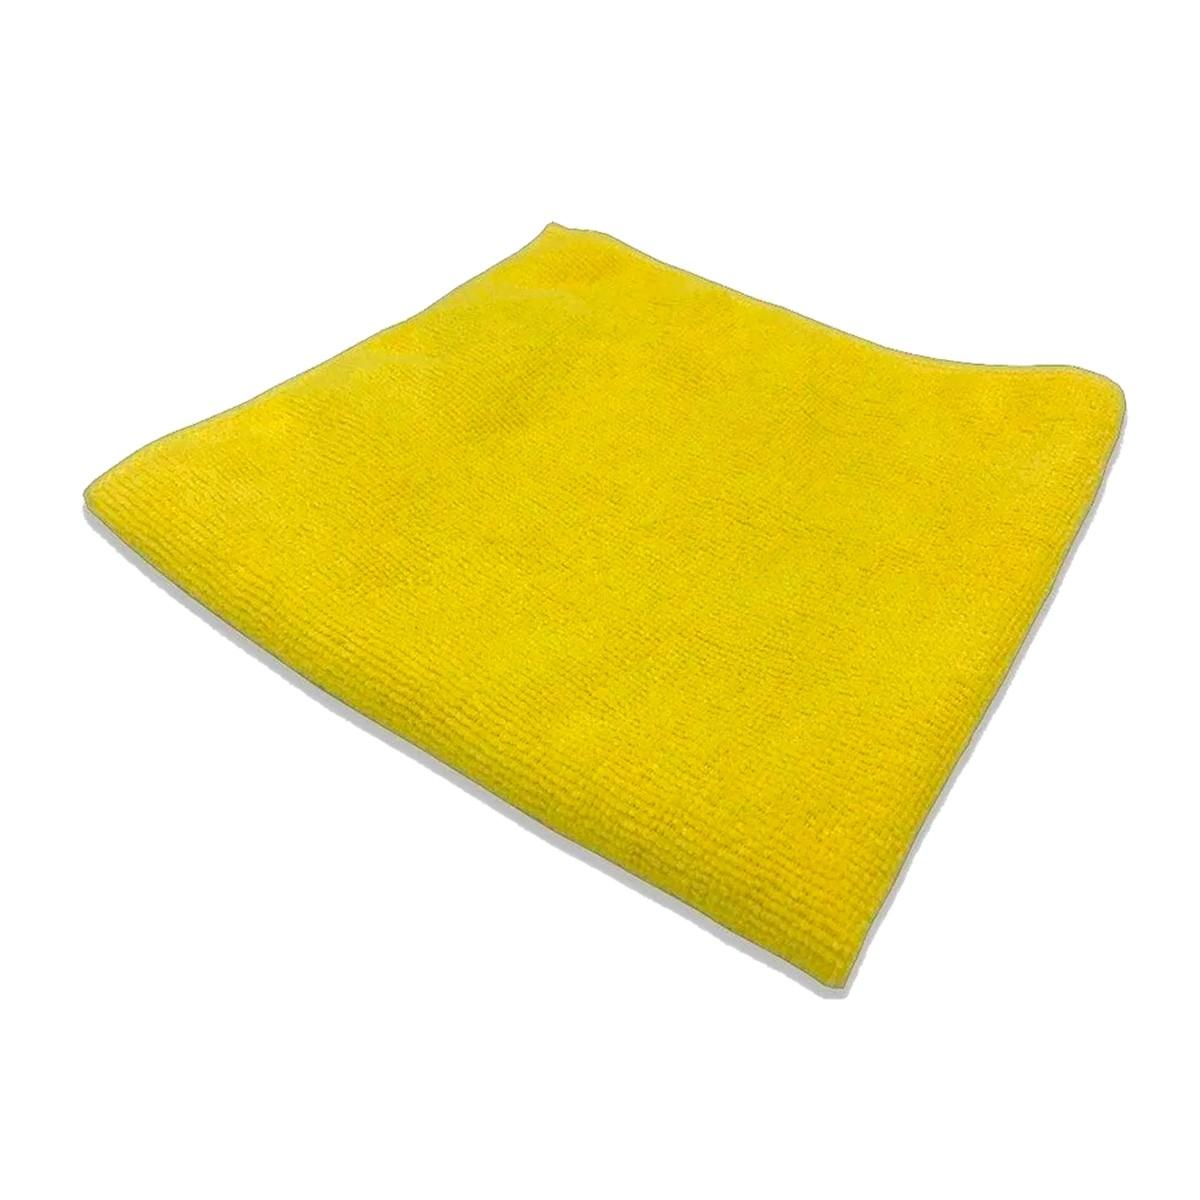 Flanela de Microfibra 37x57 330gsm Amarelo - Detailer